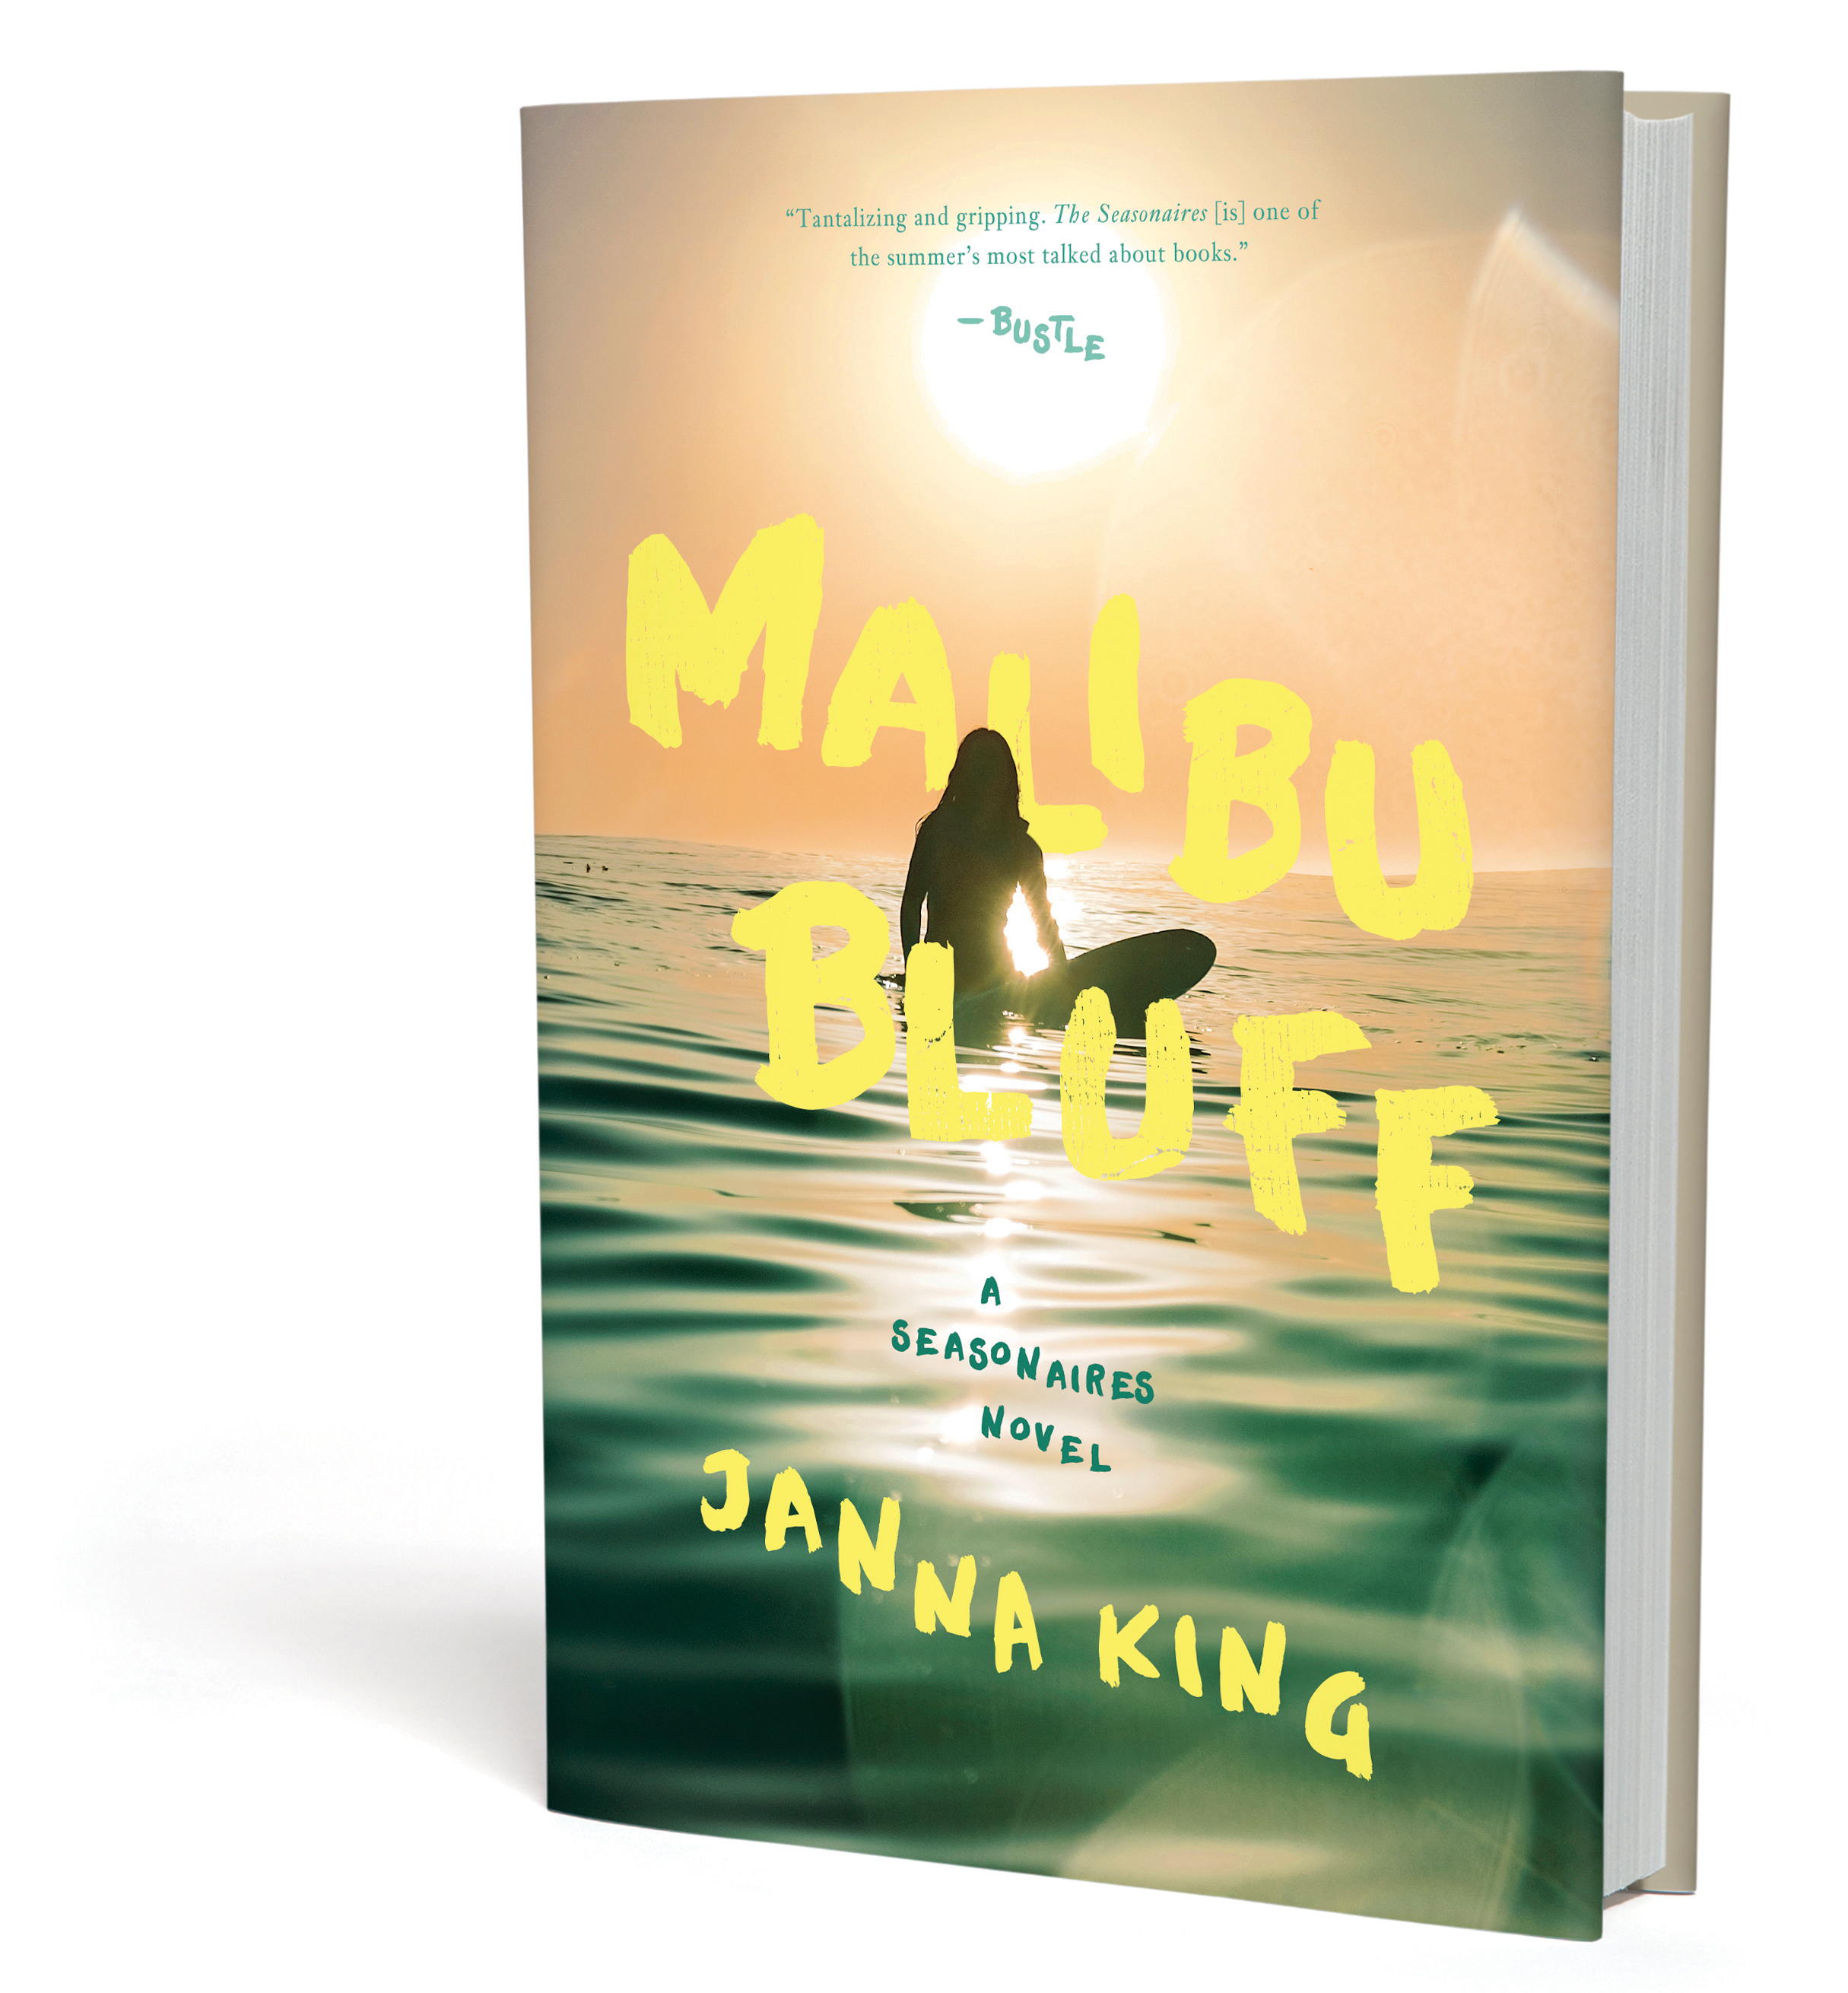 MALIBU BLUFF - A SEASONAIRES NOVELNOW AVAILABLEFROM PEGASUS BOOKS